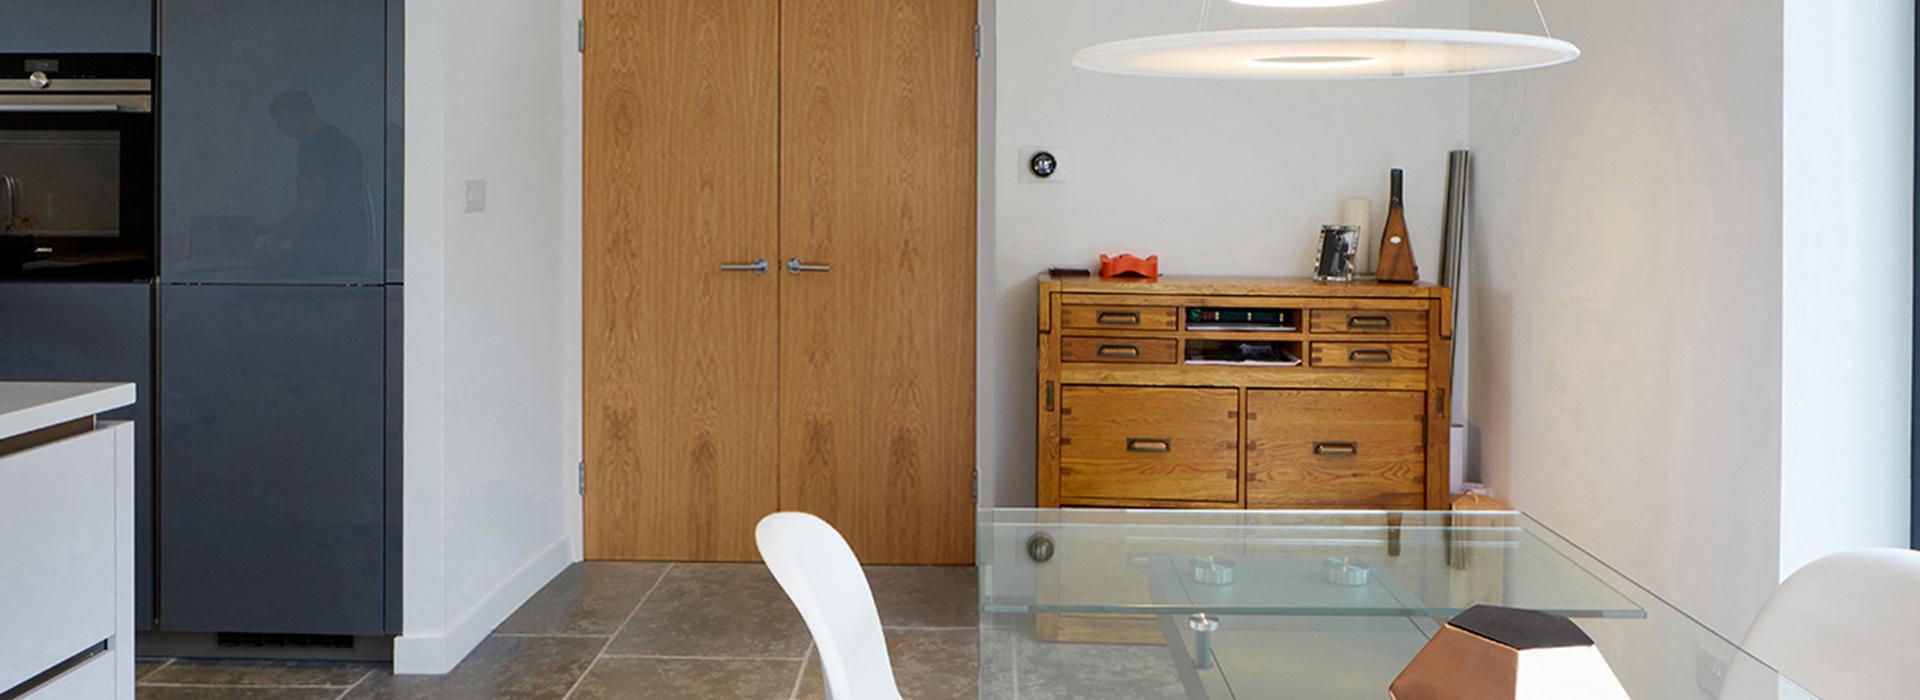 Oak doors in white frames